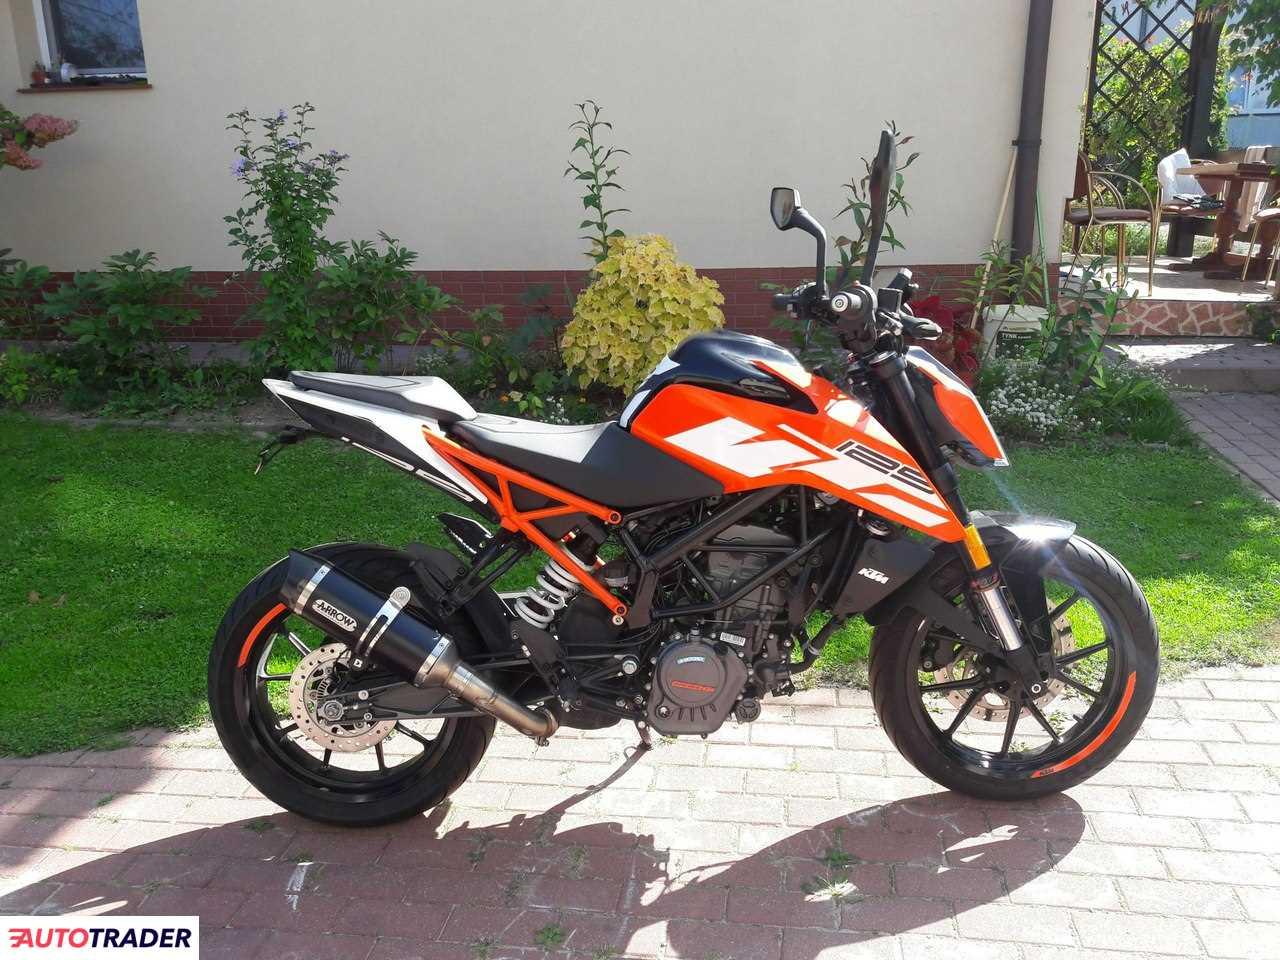 Motoryzacja - Motocykle